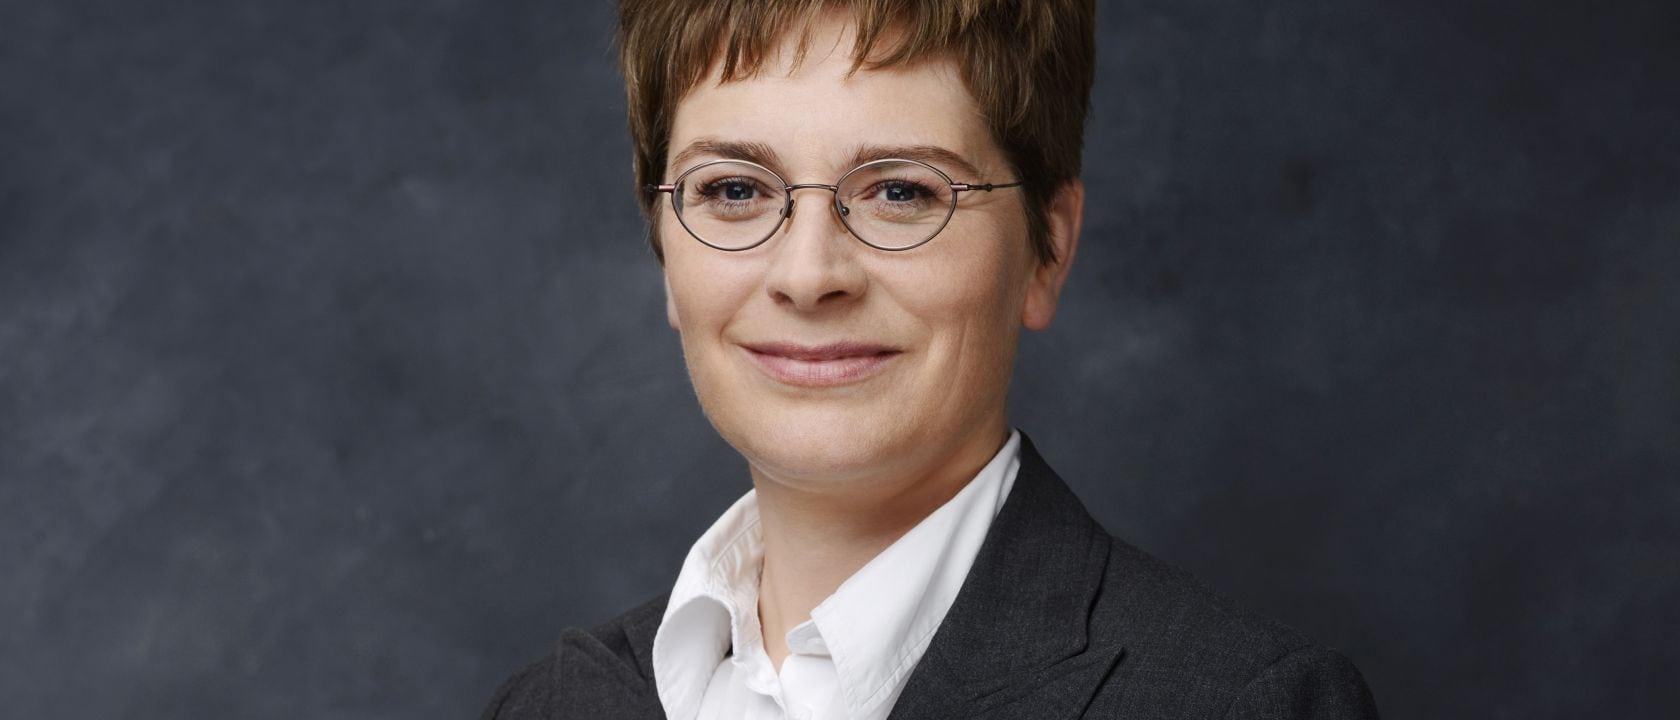 Sonja Epping